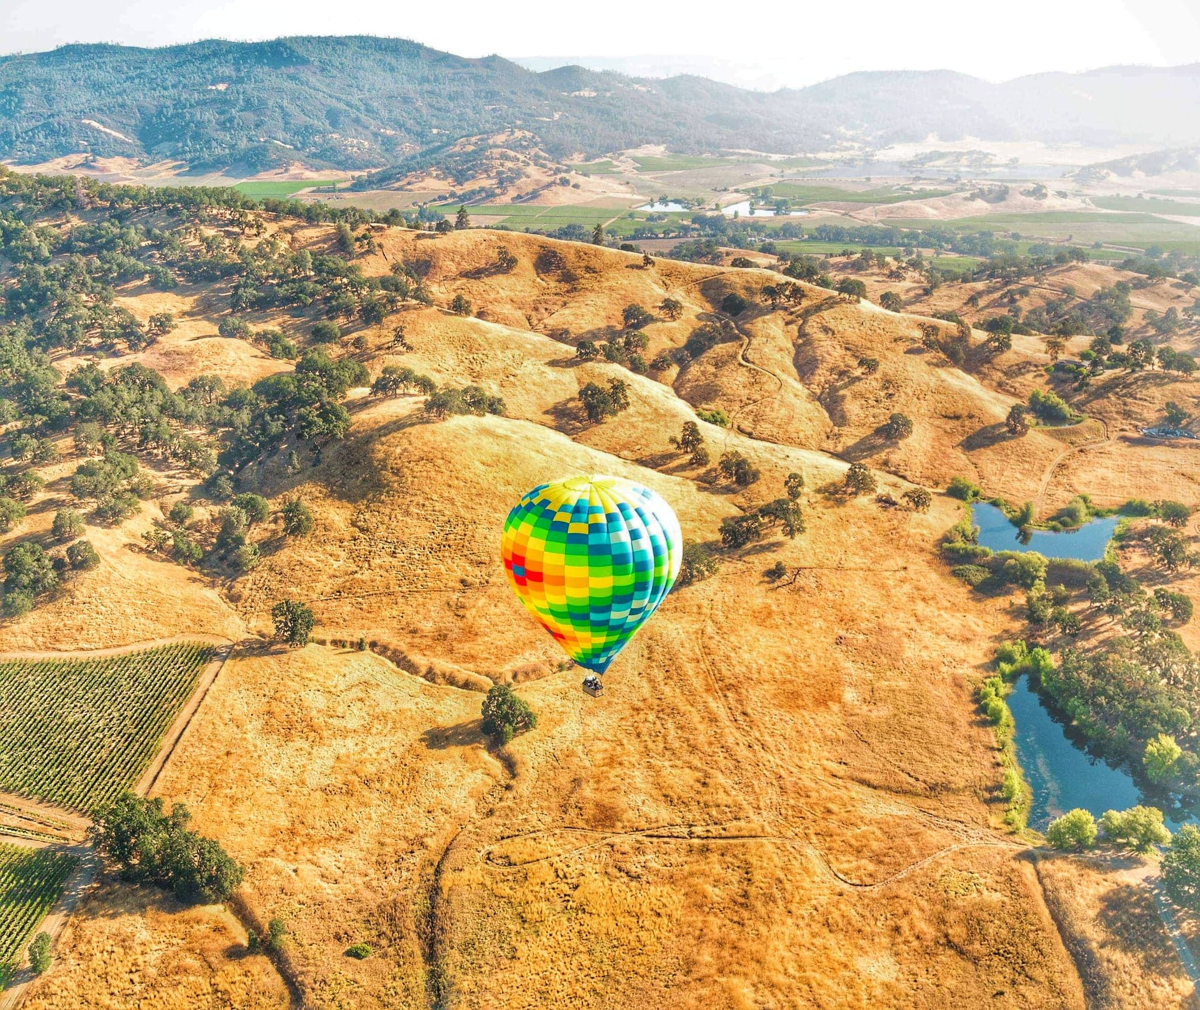 romantic getaways Northern California - Napa Hot Air Balloon Ride